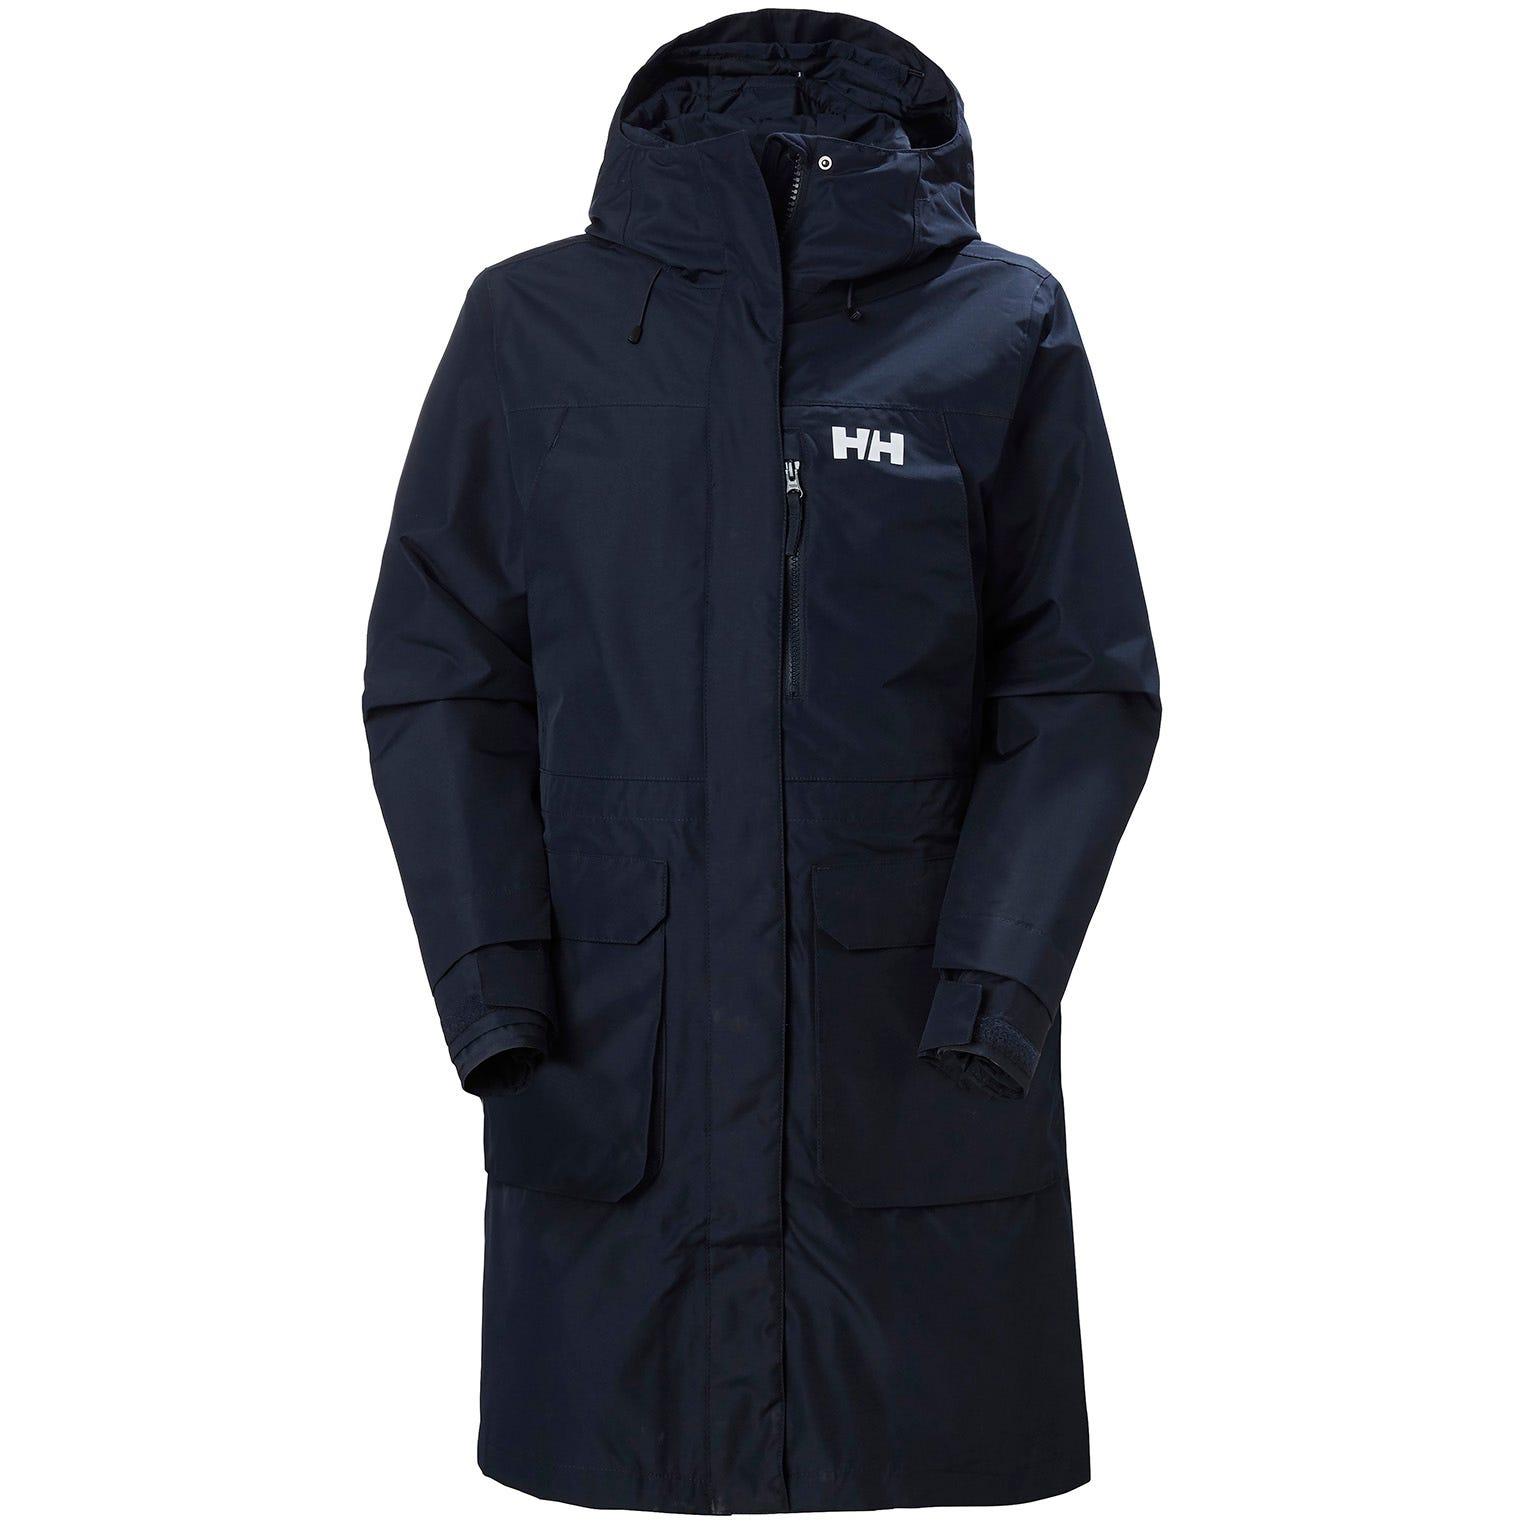 Womens Rigging Waterproof Long Coat | Uk Helly Hansen Womens Parka Navy M